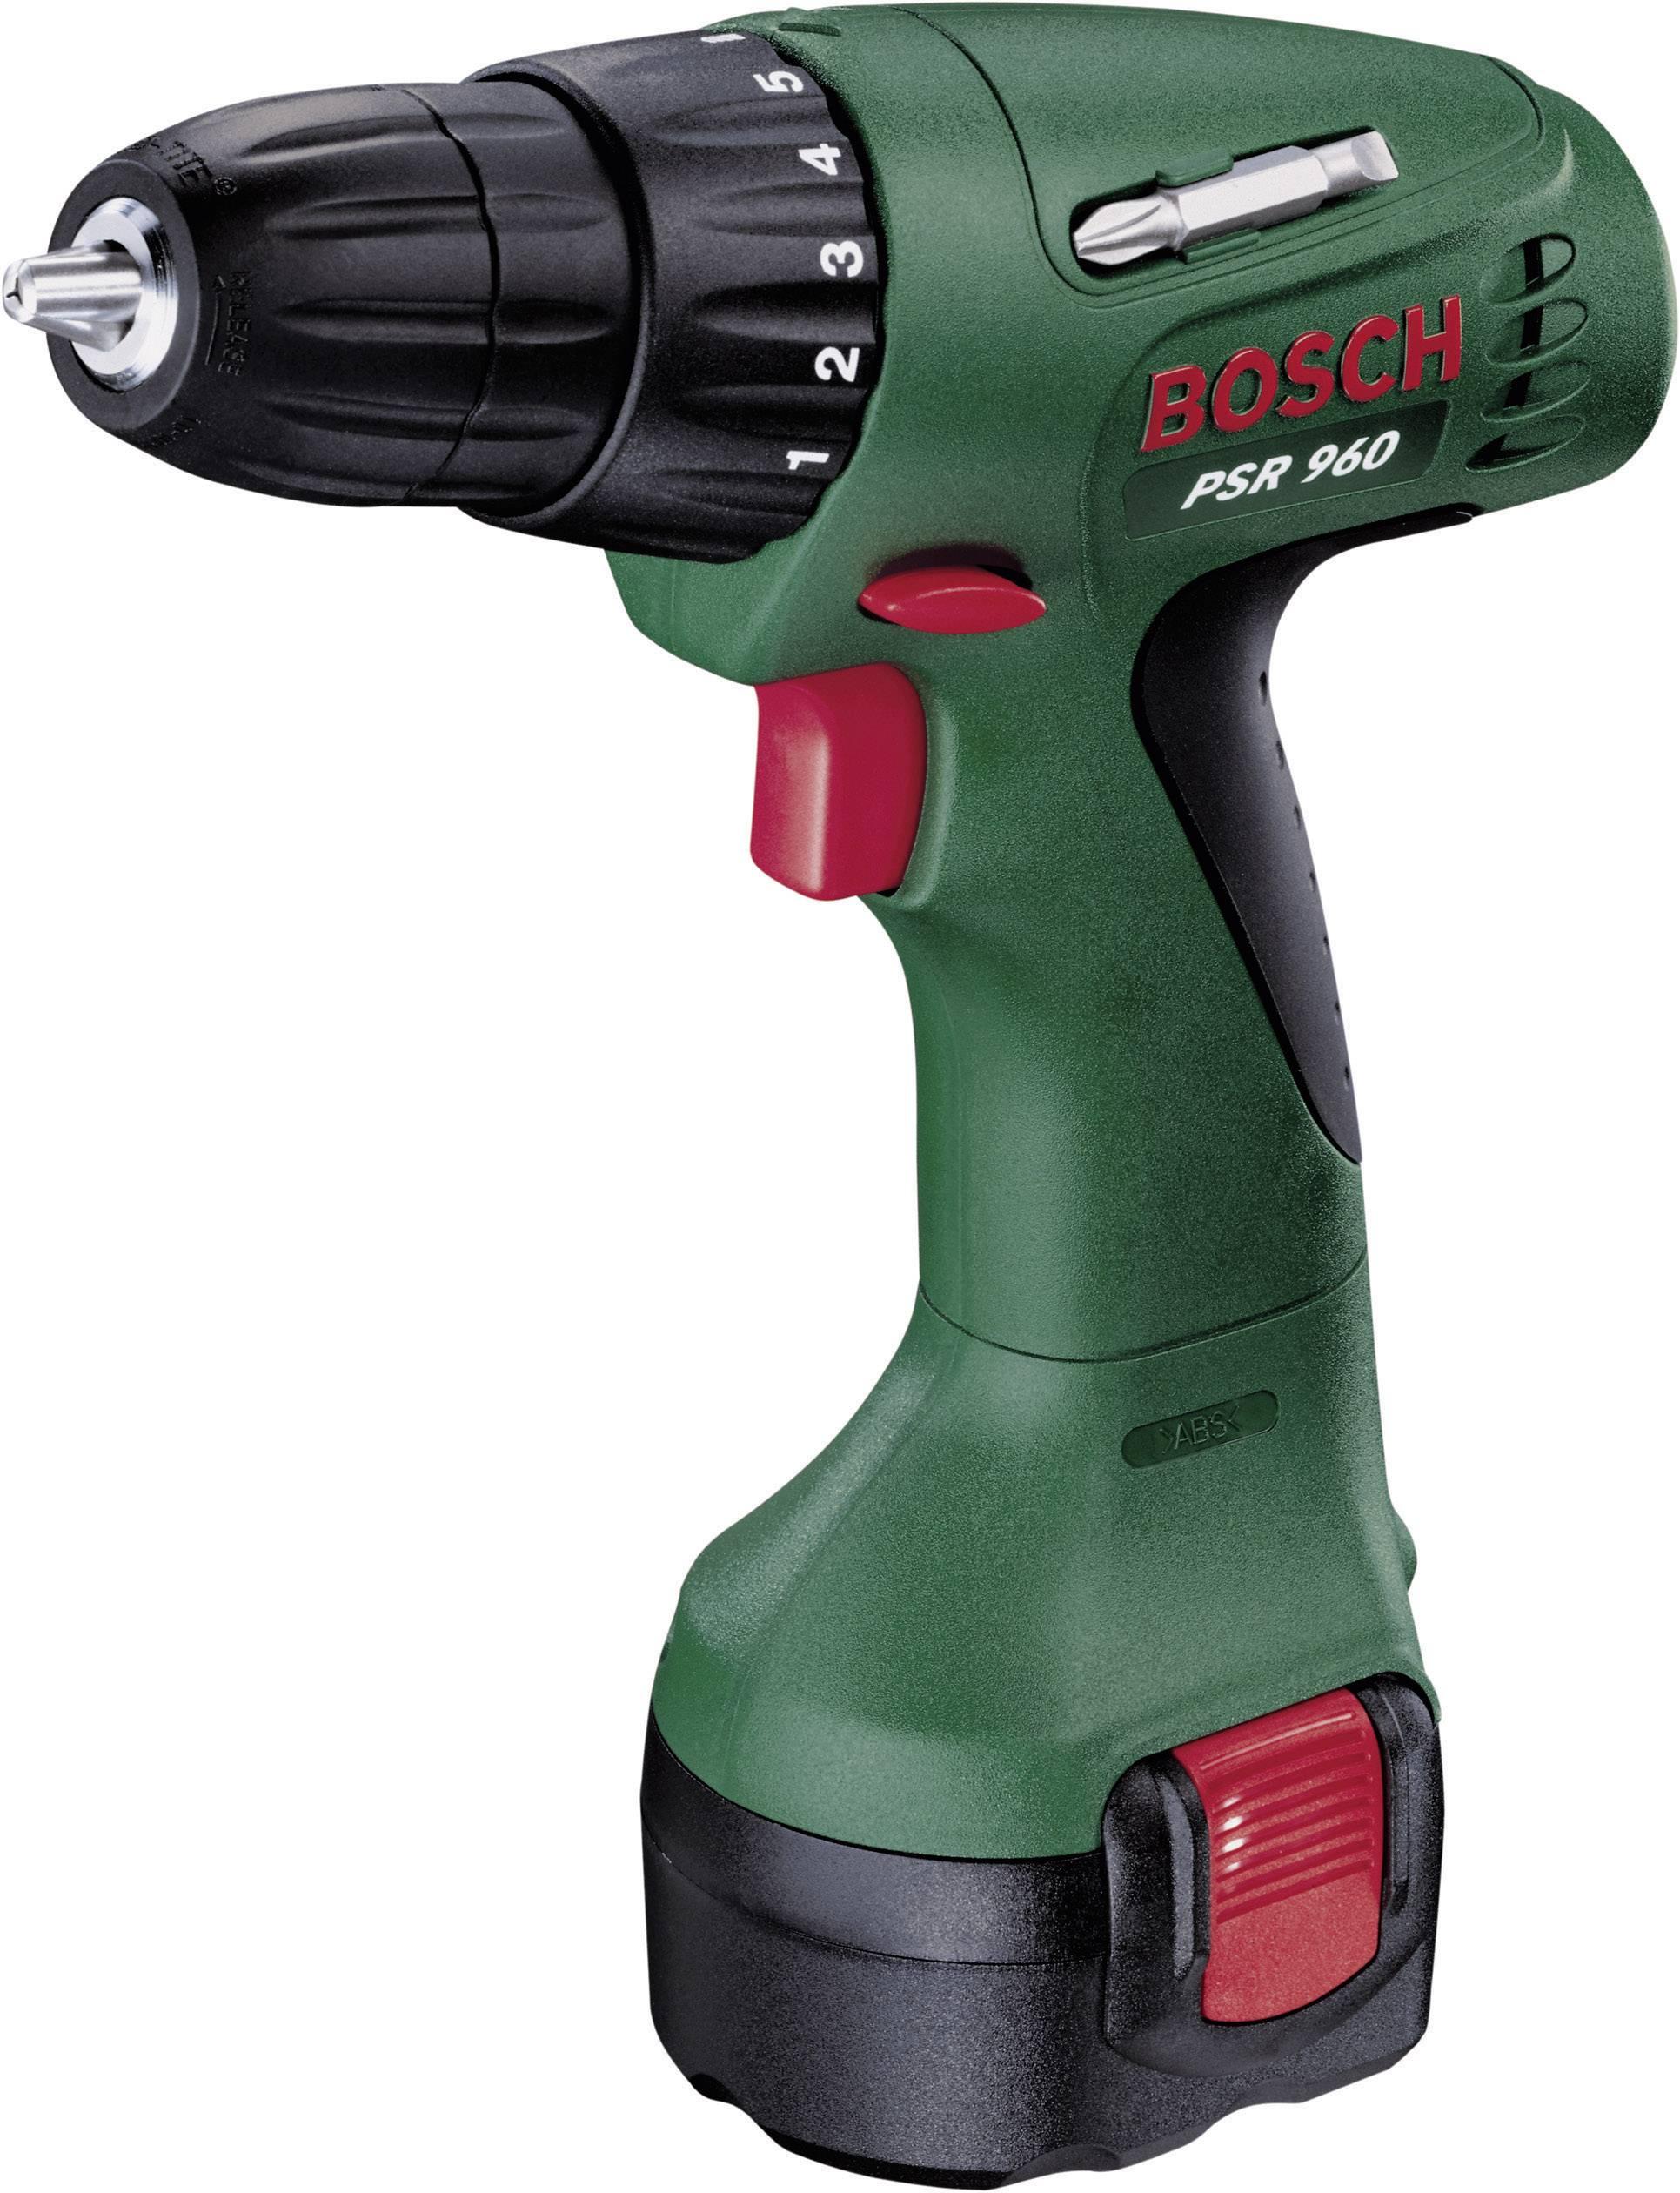 Top Bosch PSR 960 Accuschroefboormachine incl. accu, incl. koffer IK42